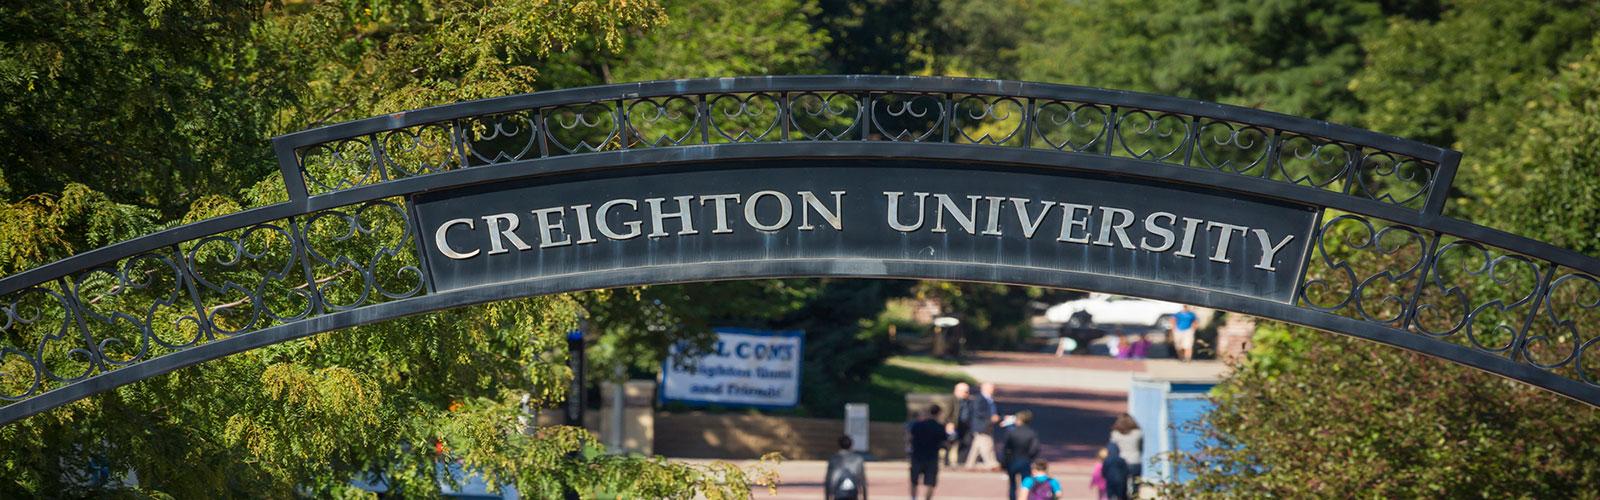 Creighton University Arch